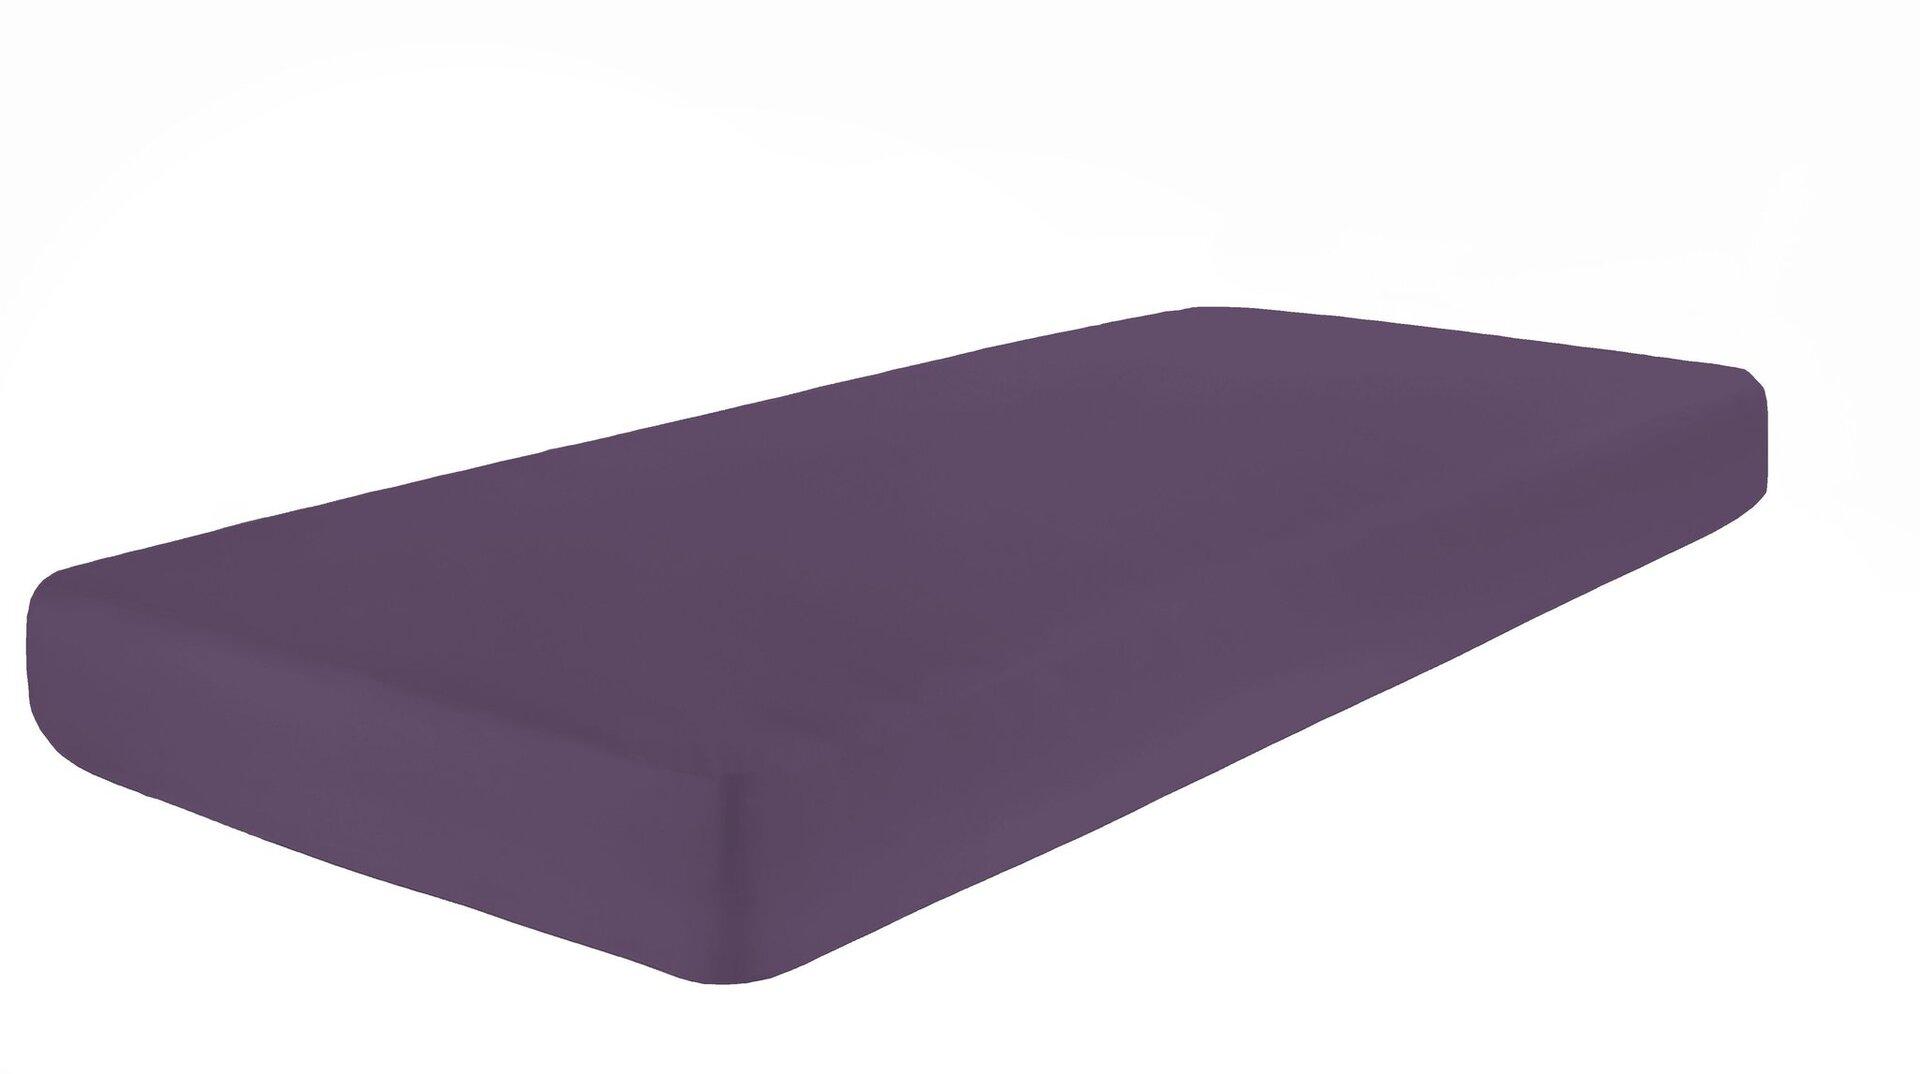 Jersey-Spannbetttuch Pro Night Textil lila 2 x 2 cm